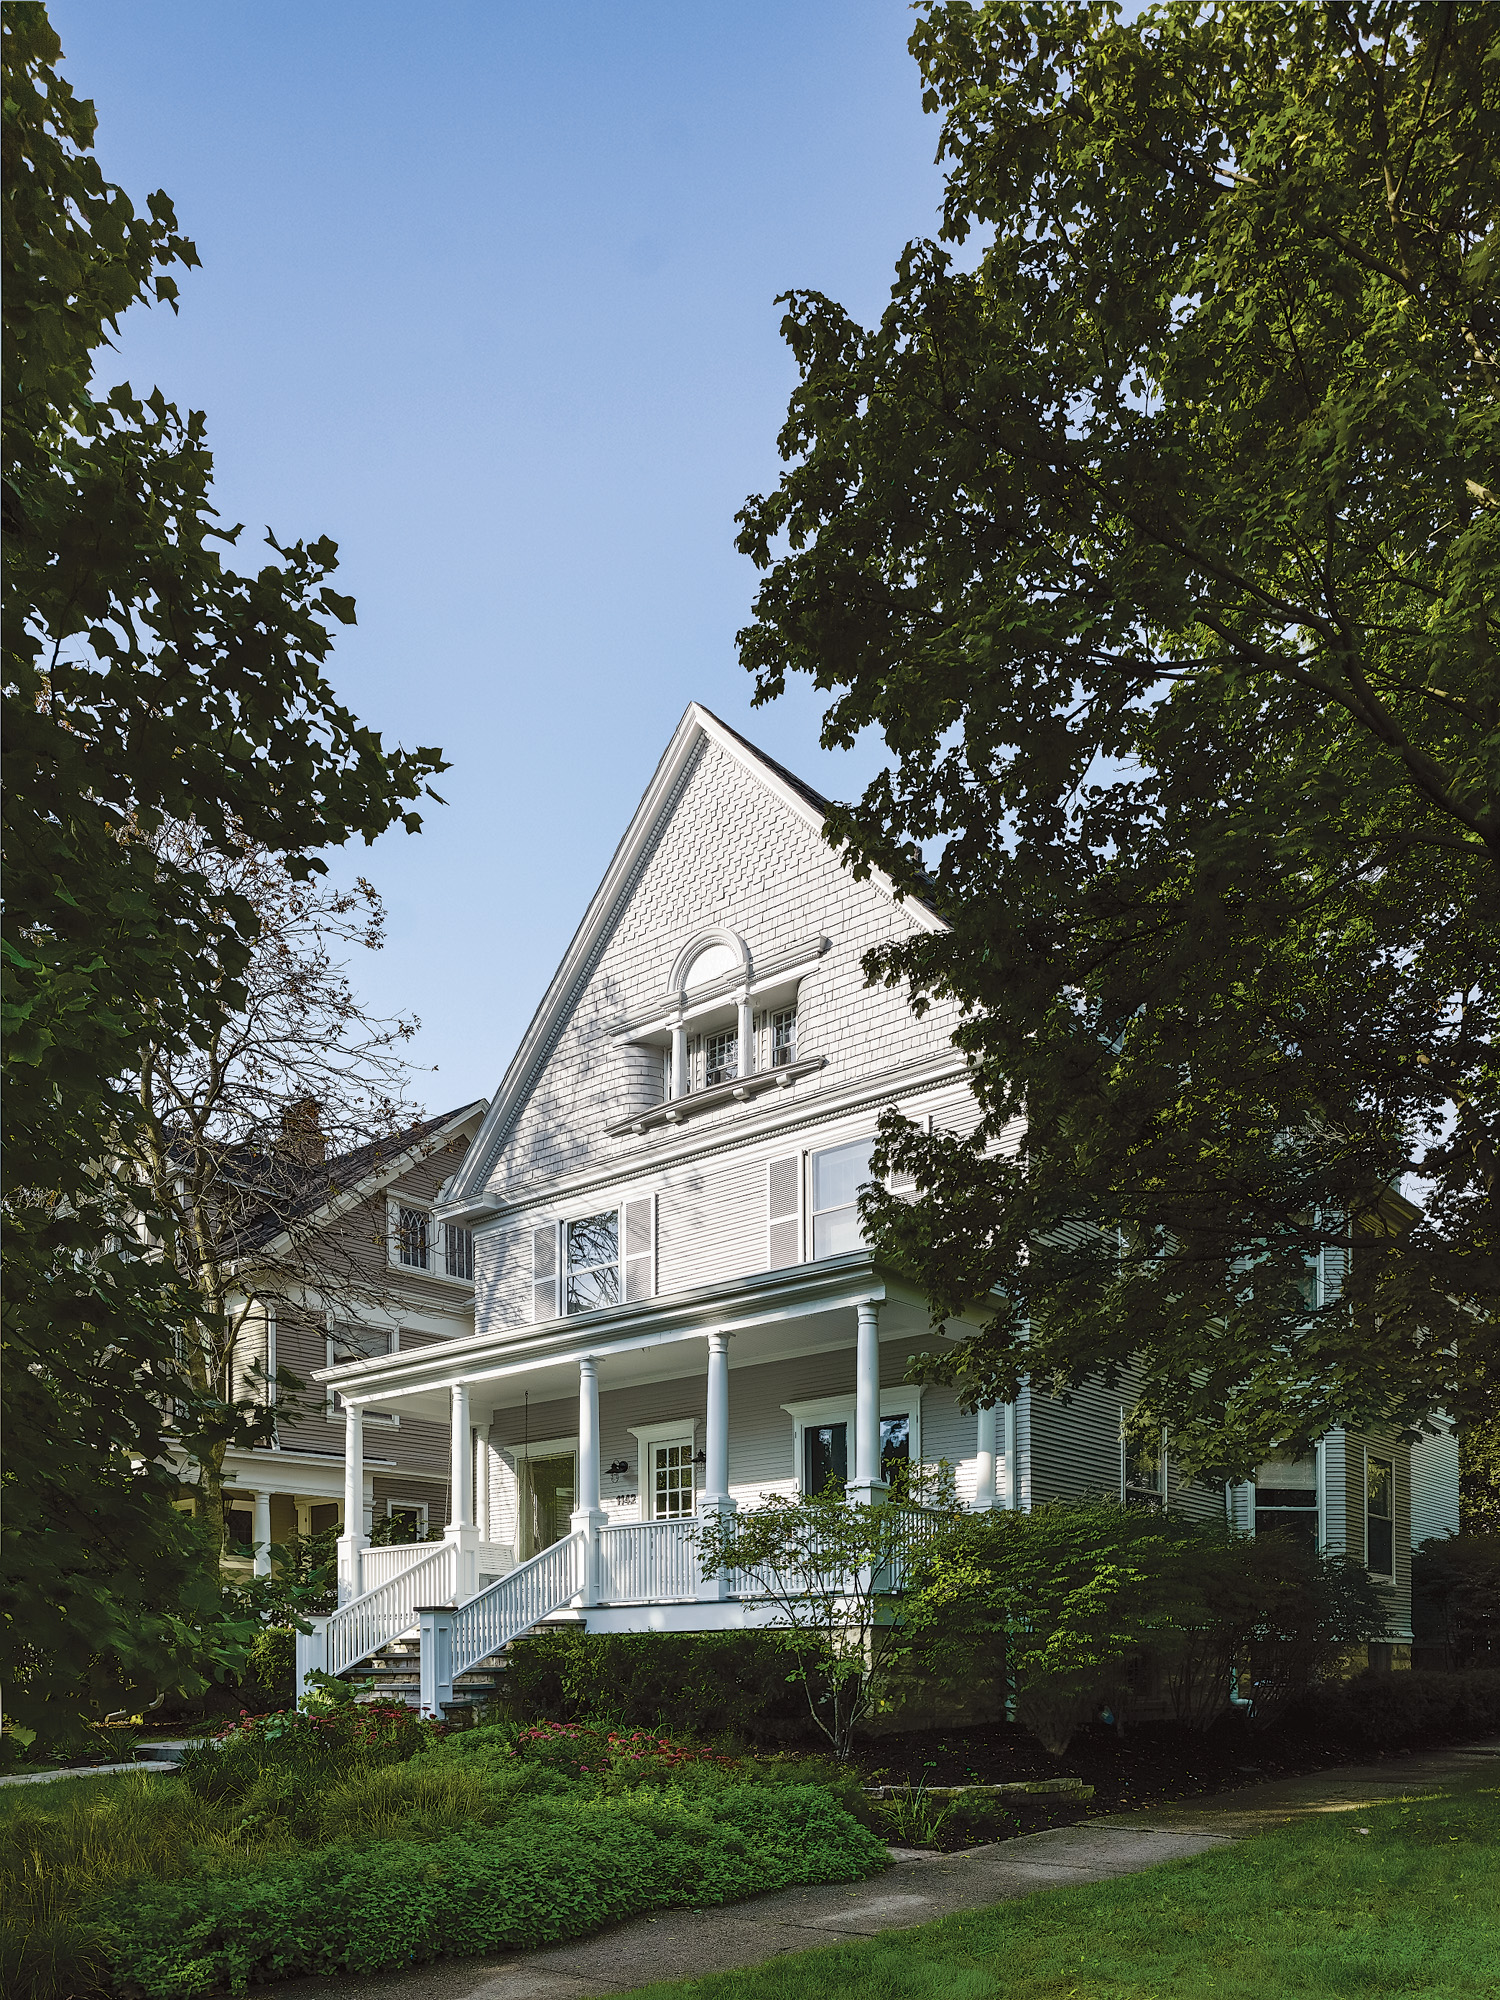 Renovating a Victorian? - Restoration & Design for the Vintage House ...